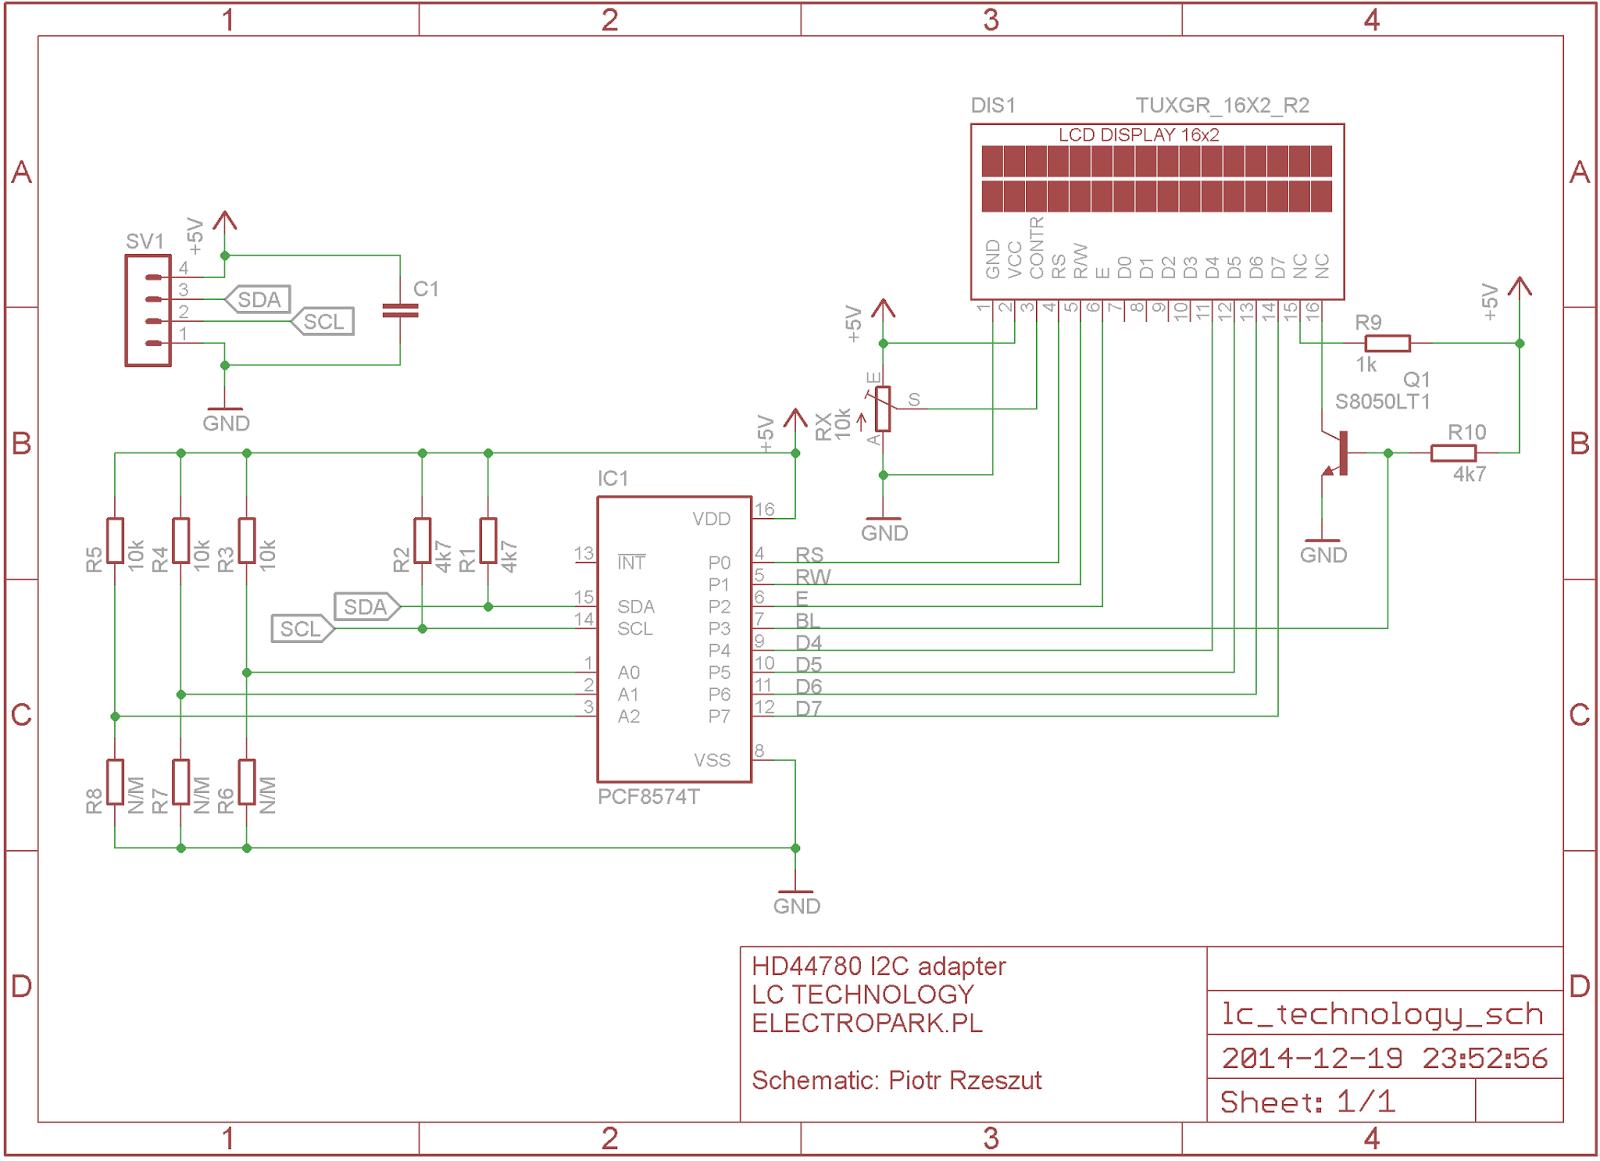 Adapter HD44780 I²C - schemat modułu z oferty Electropark.pl (produkcja LC Technology)